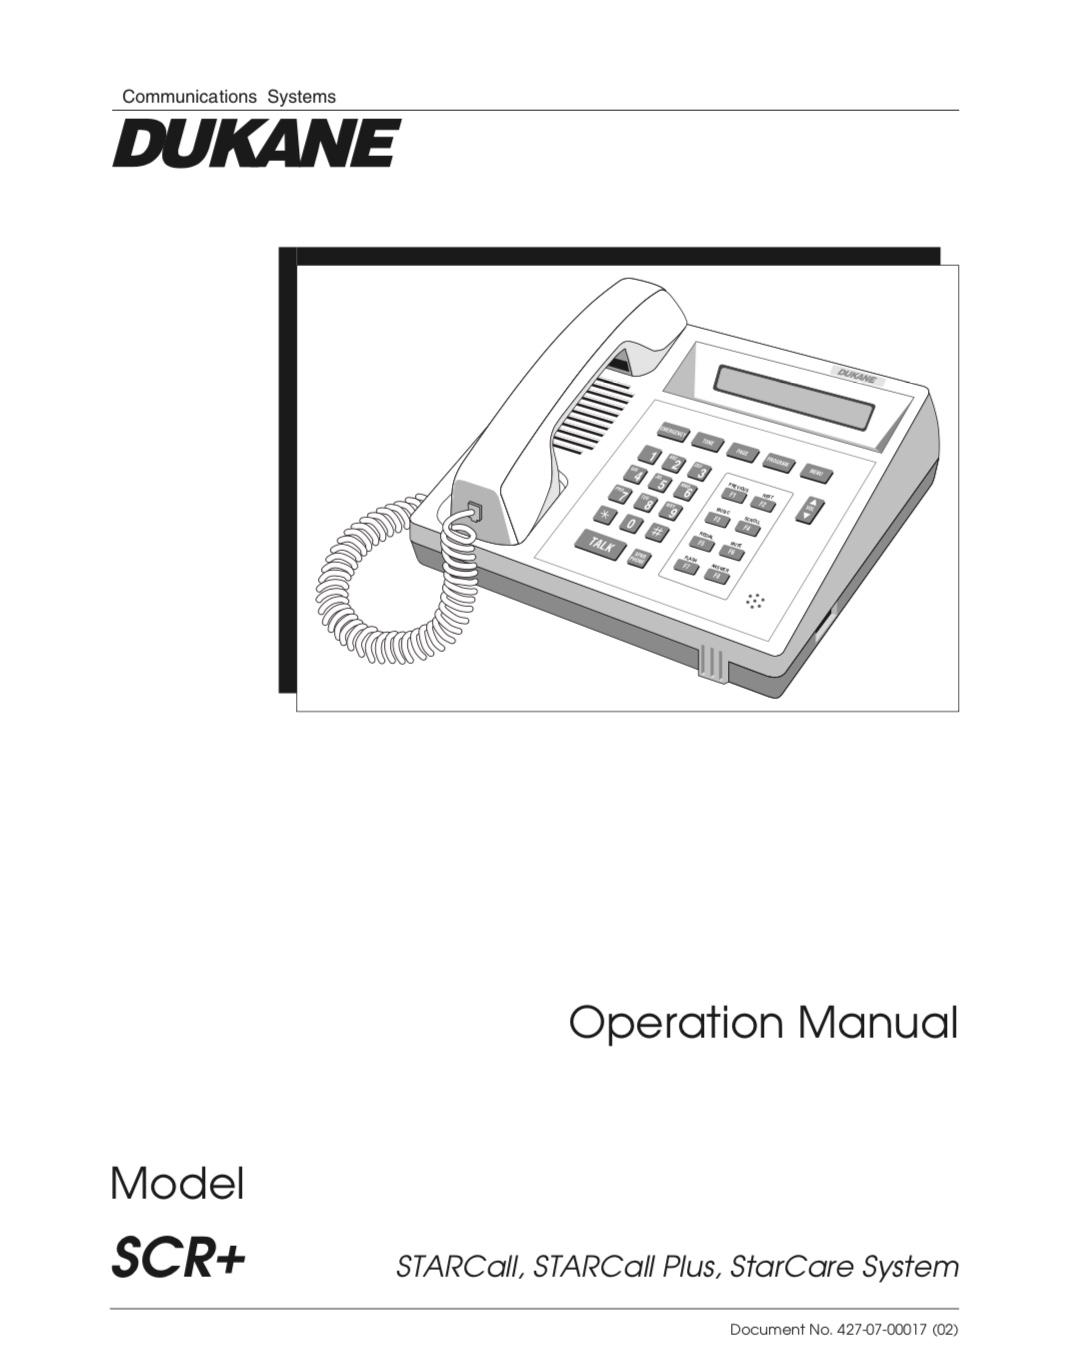 Dukane STARCall Operations Manual